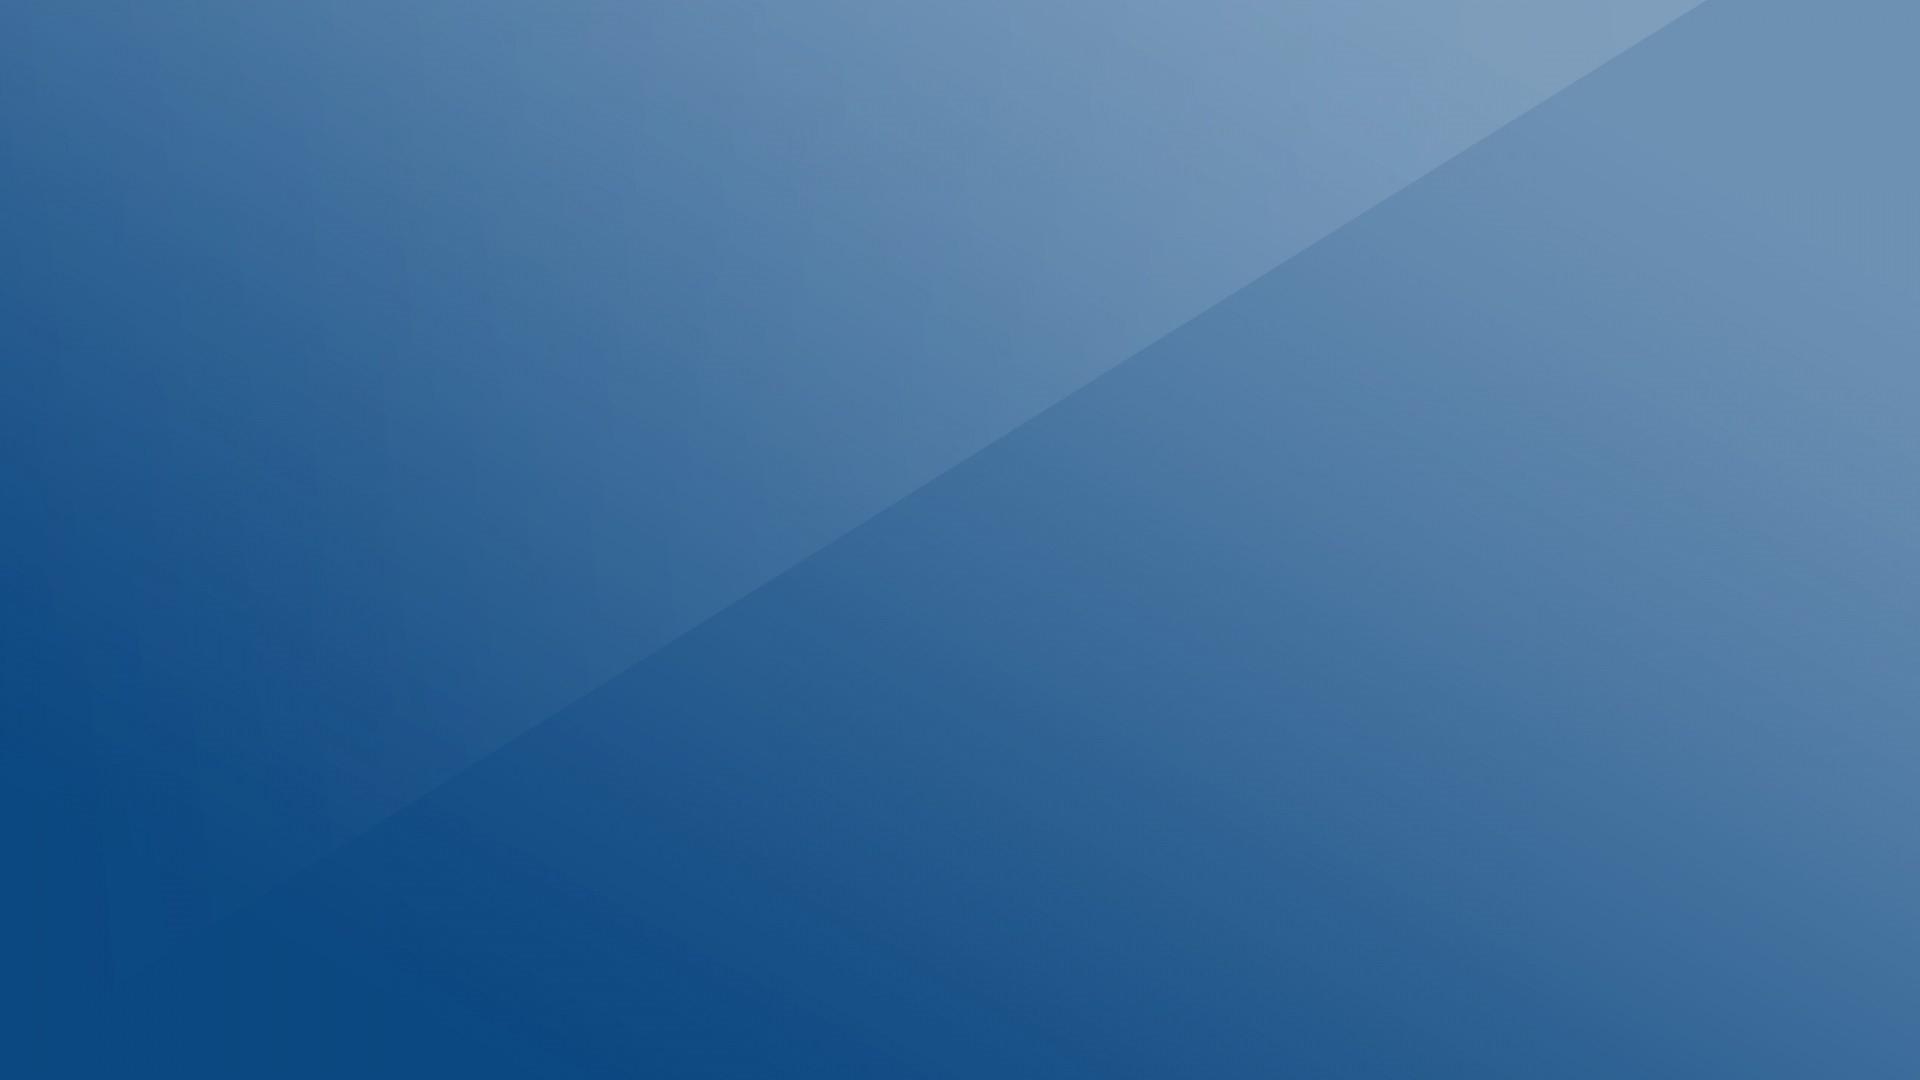 Plain Blue hd desktop wallpaper